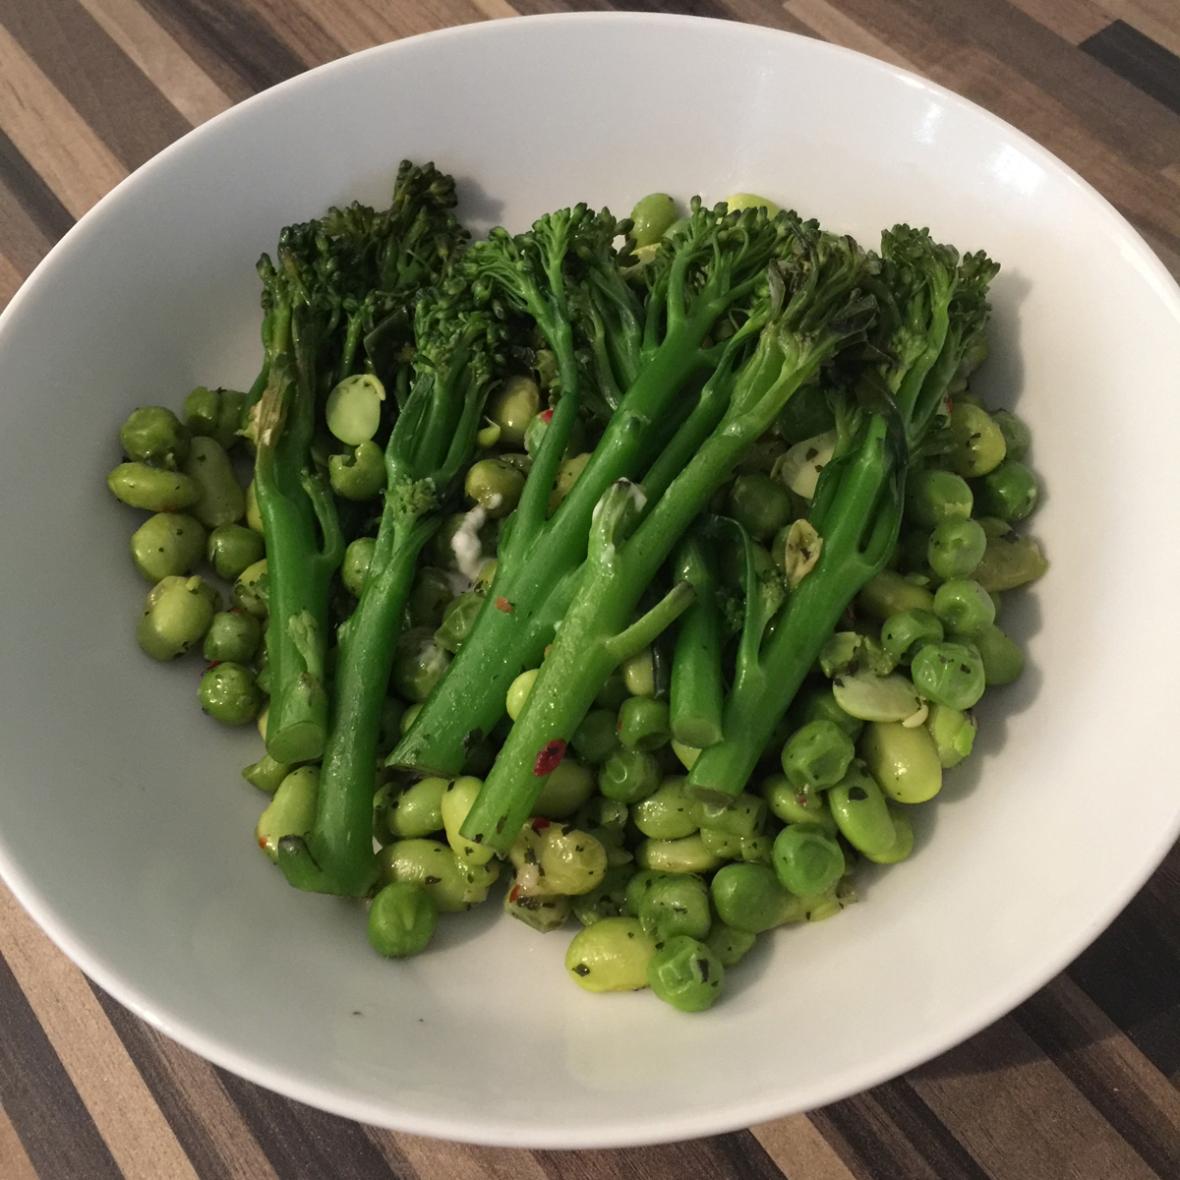 tesco-meal-deal-2-greens